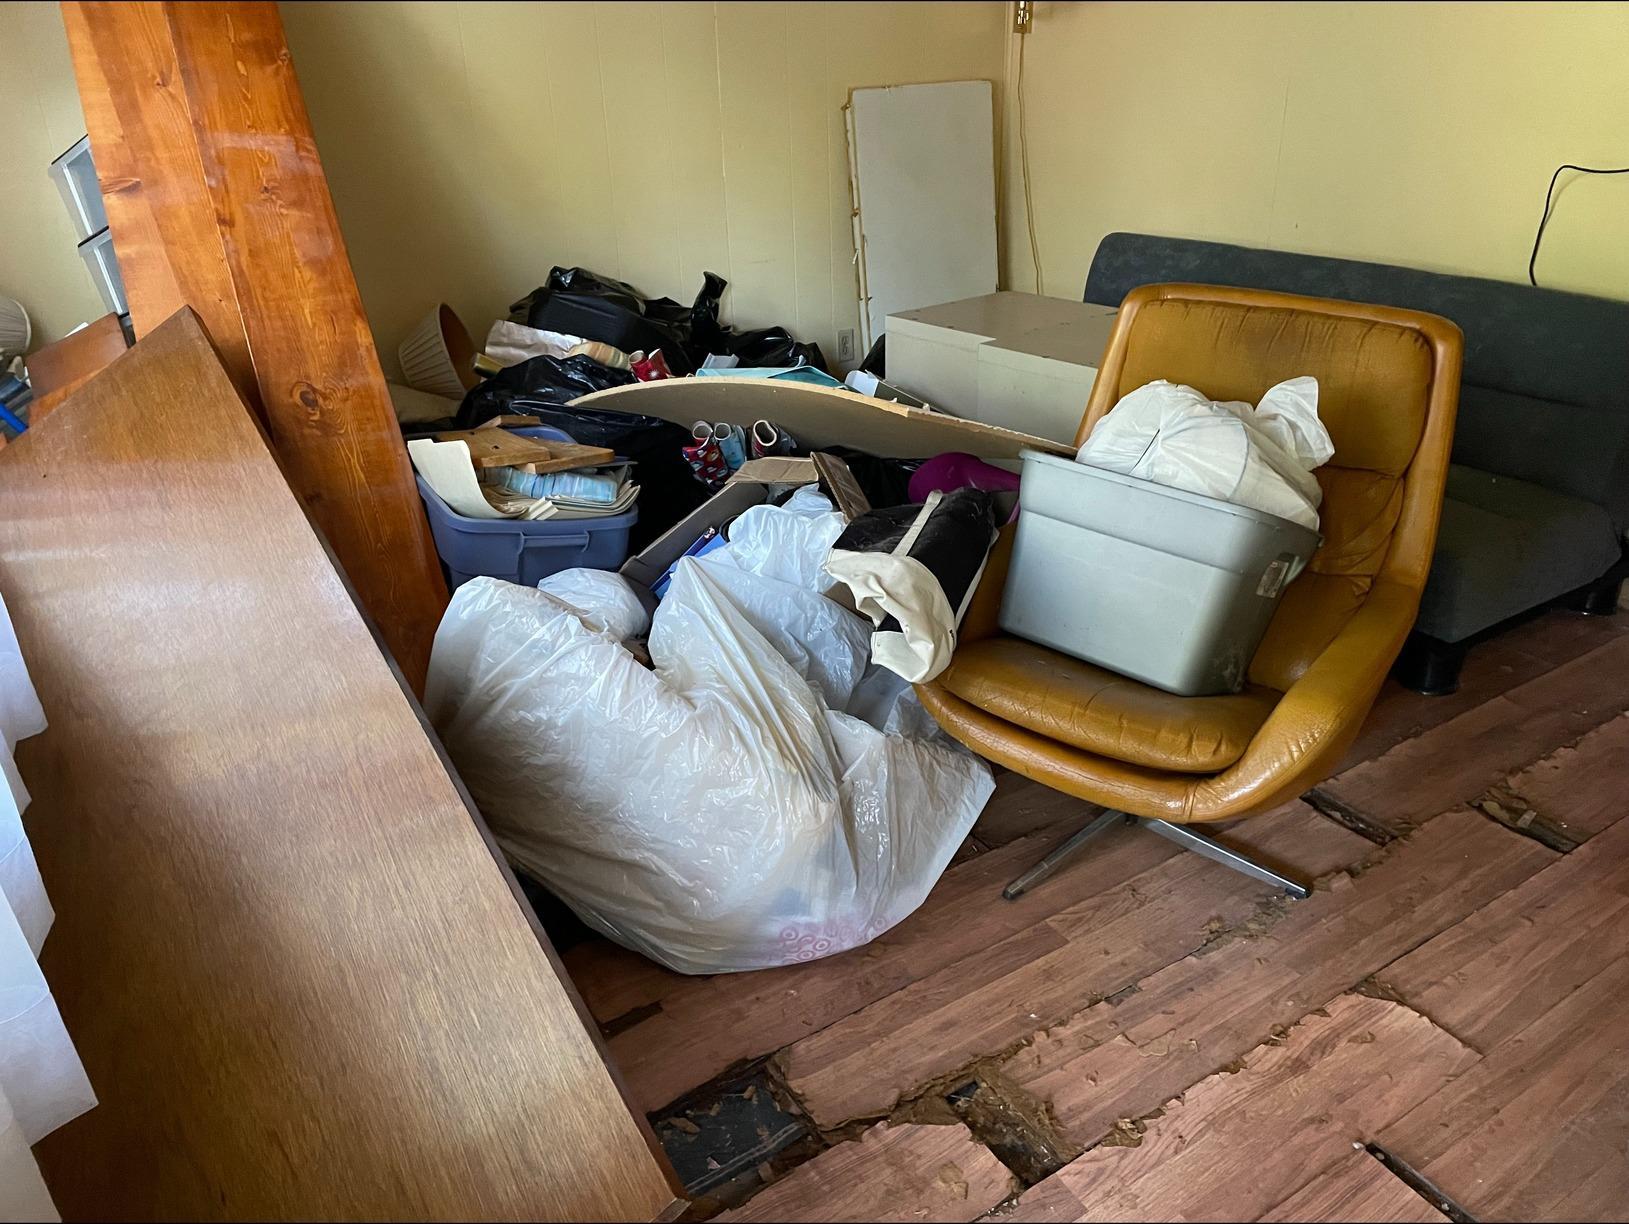 Water Damage Clean Up in Williamsburg, VA - Before Photo